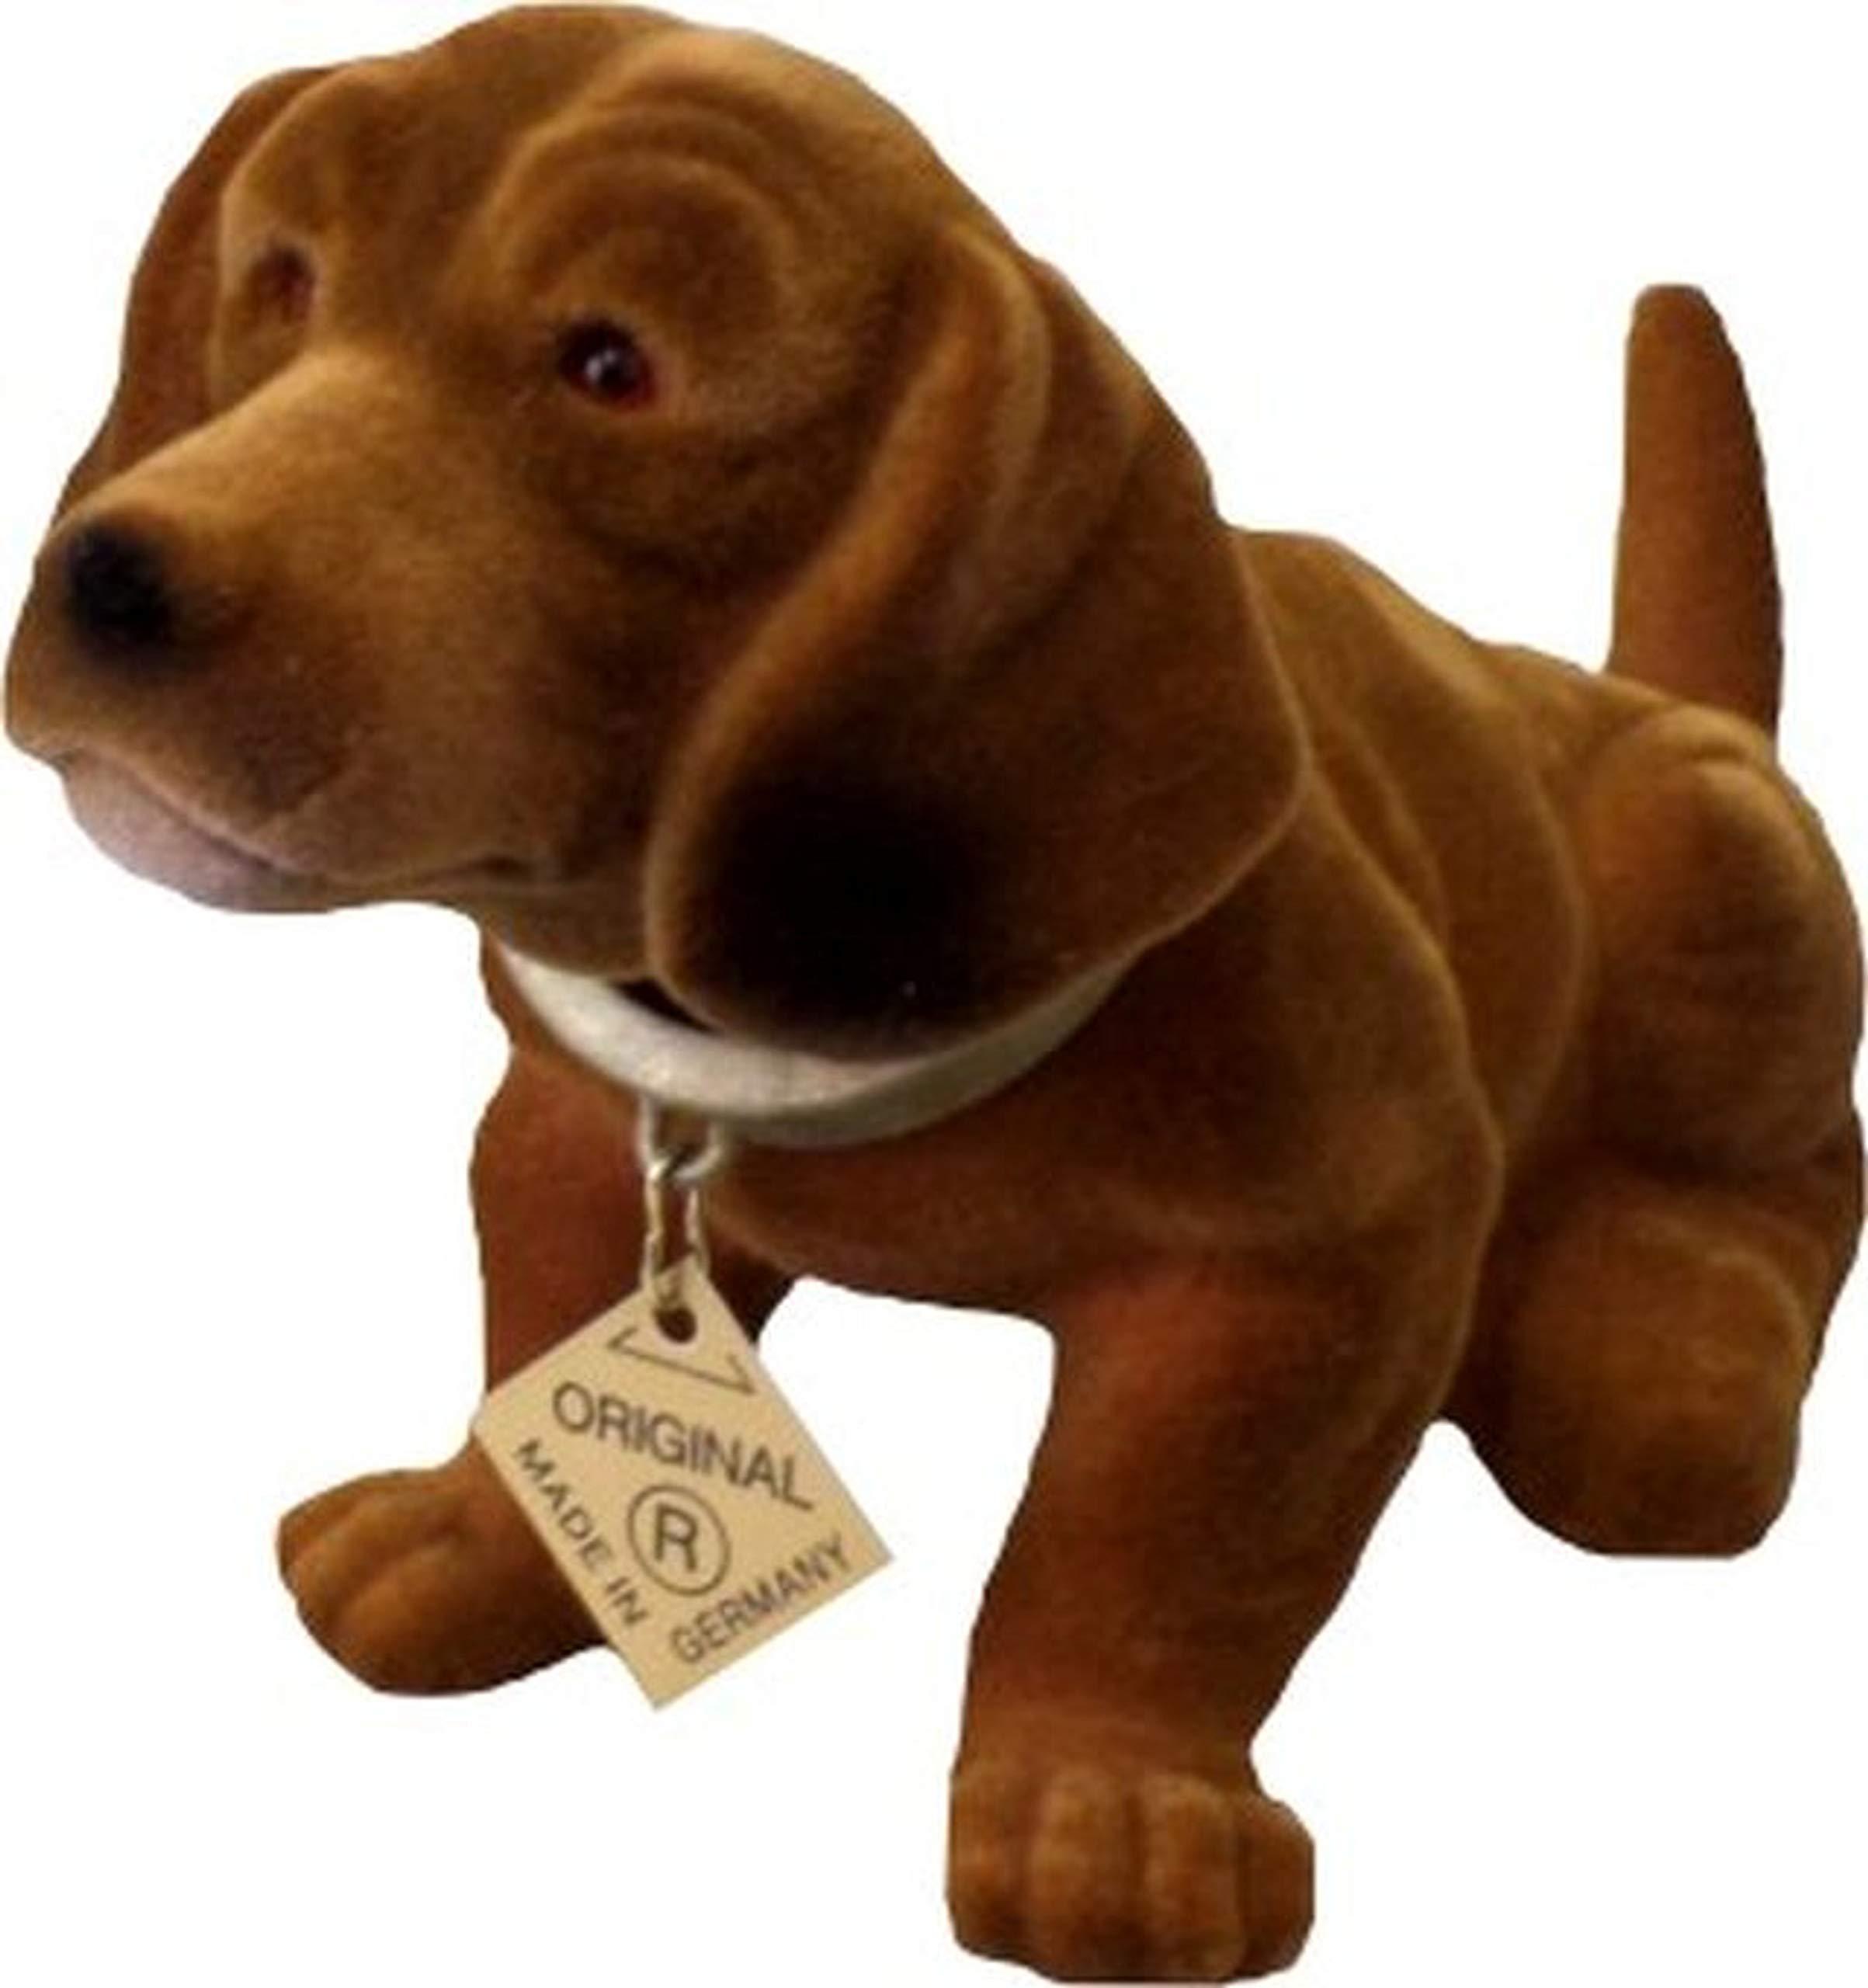 Original Wackeldackel Dog Made in Germany Bubblehead Dachshund 19 cm